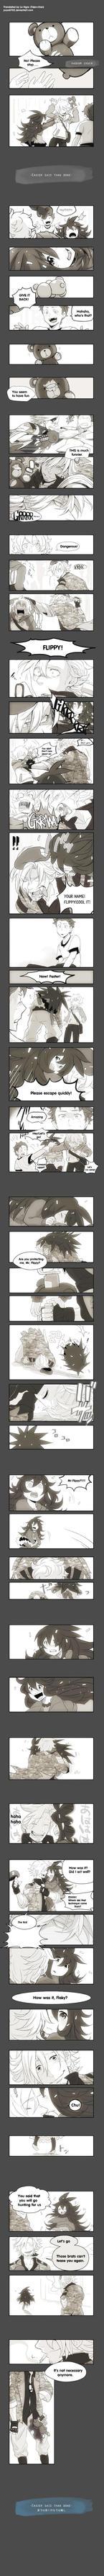 HTF doujinshi translation #38 by minglee7294